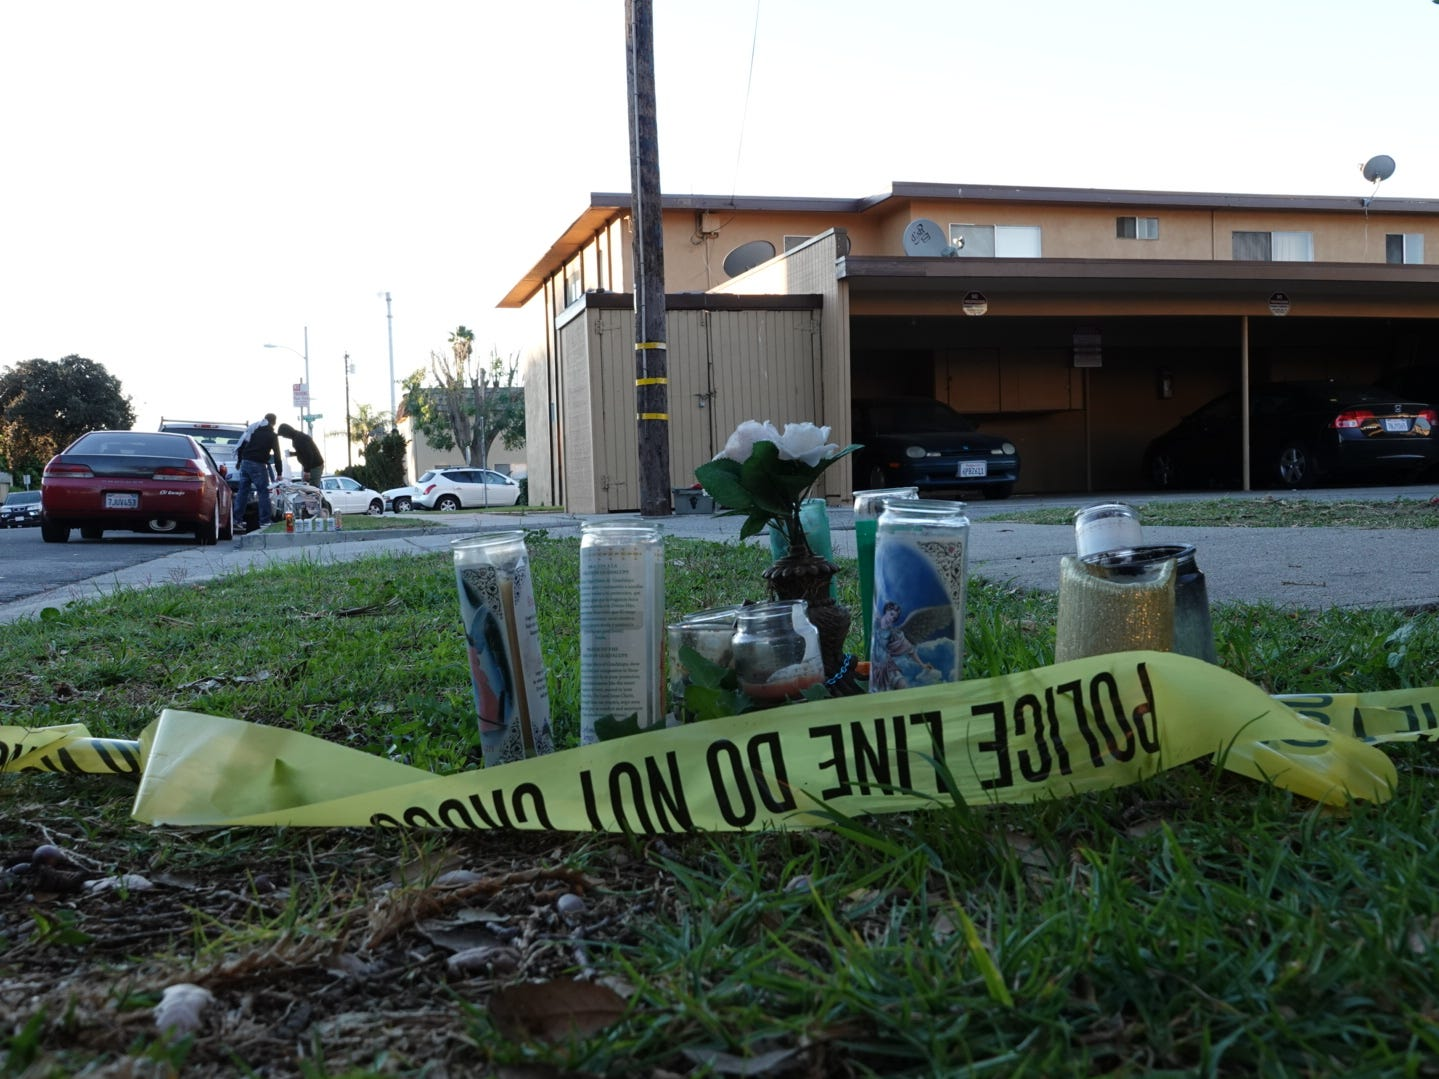 Authorities name Ventura man killed in Friday night shooting